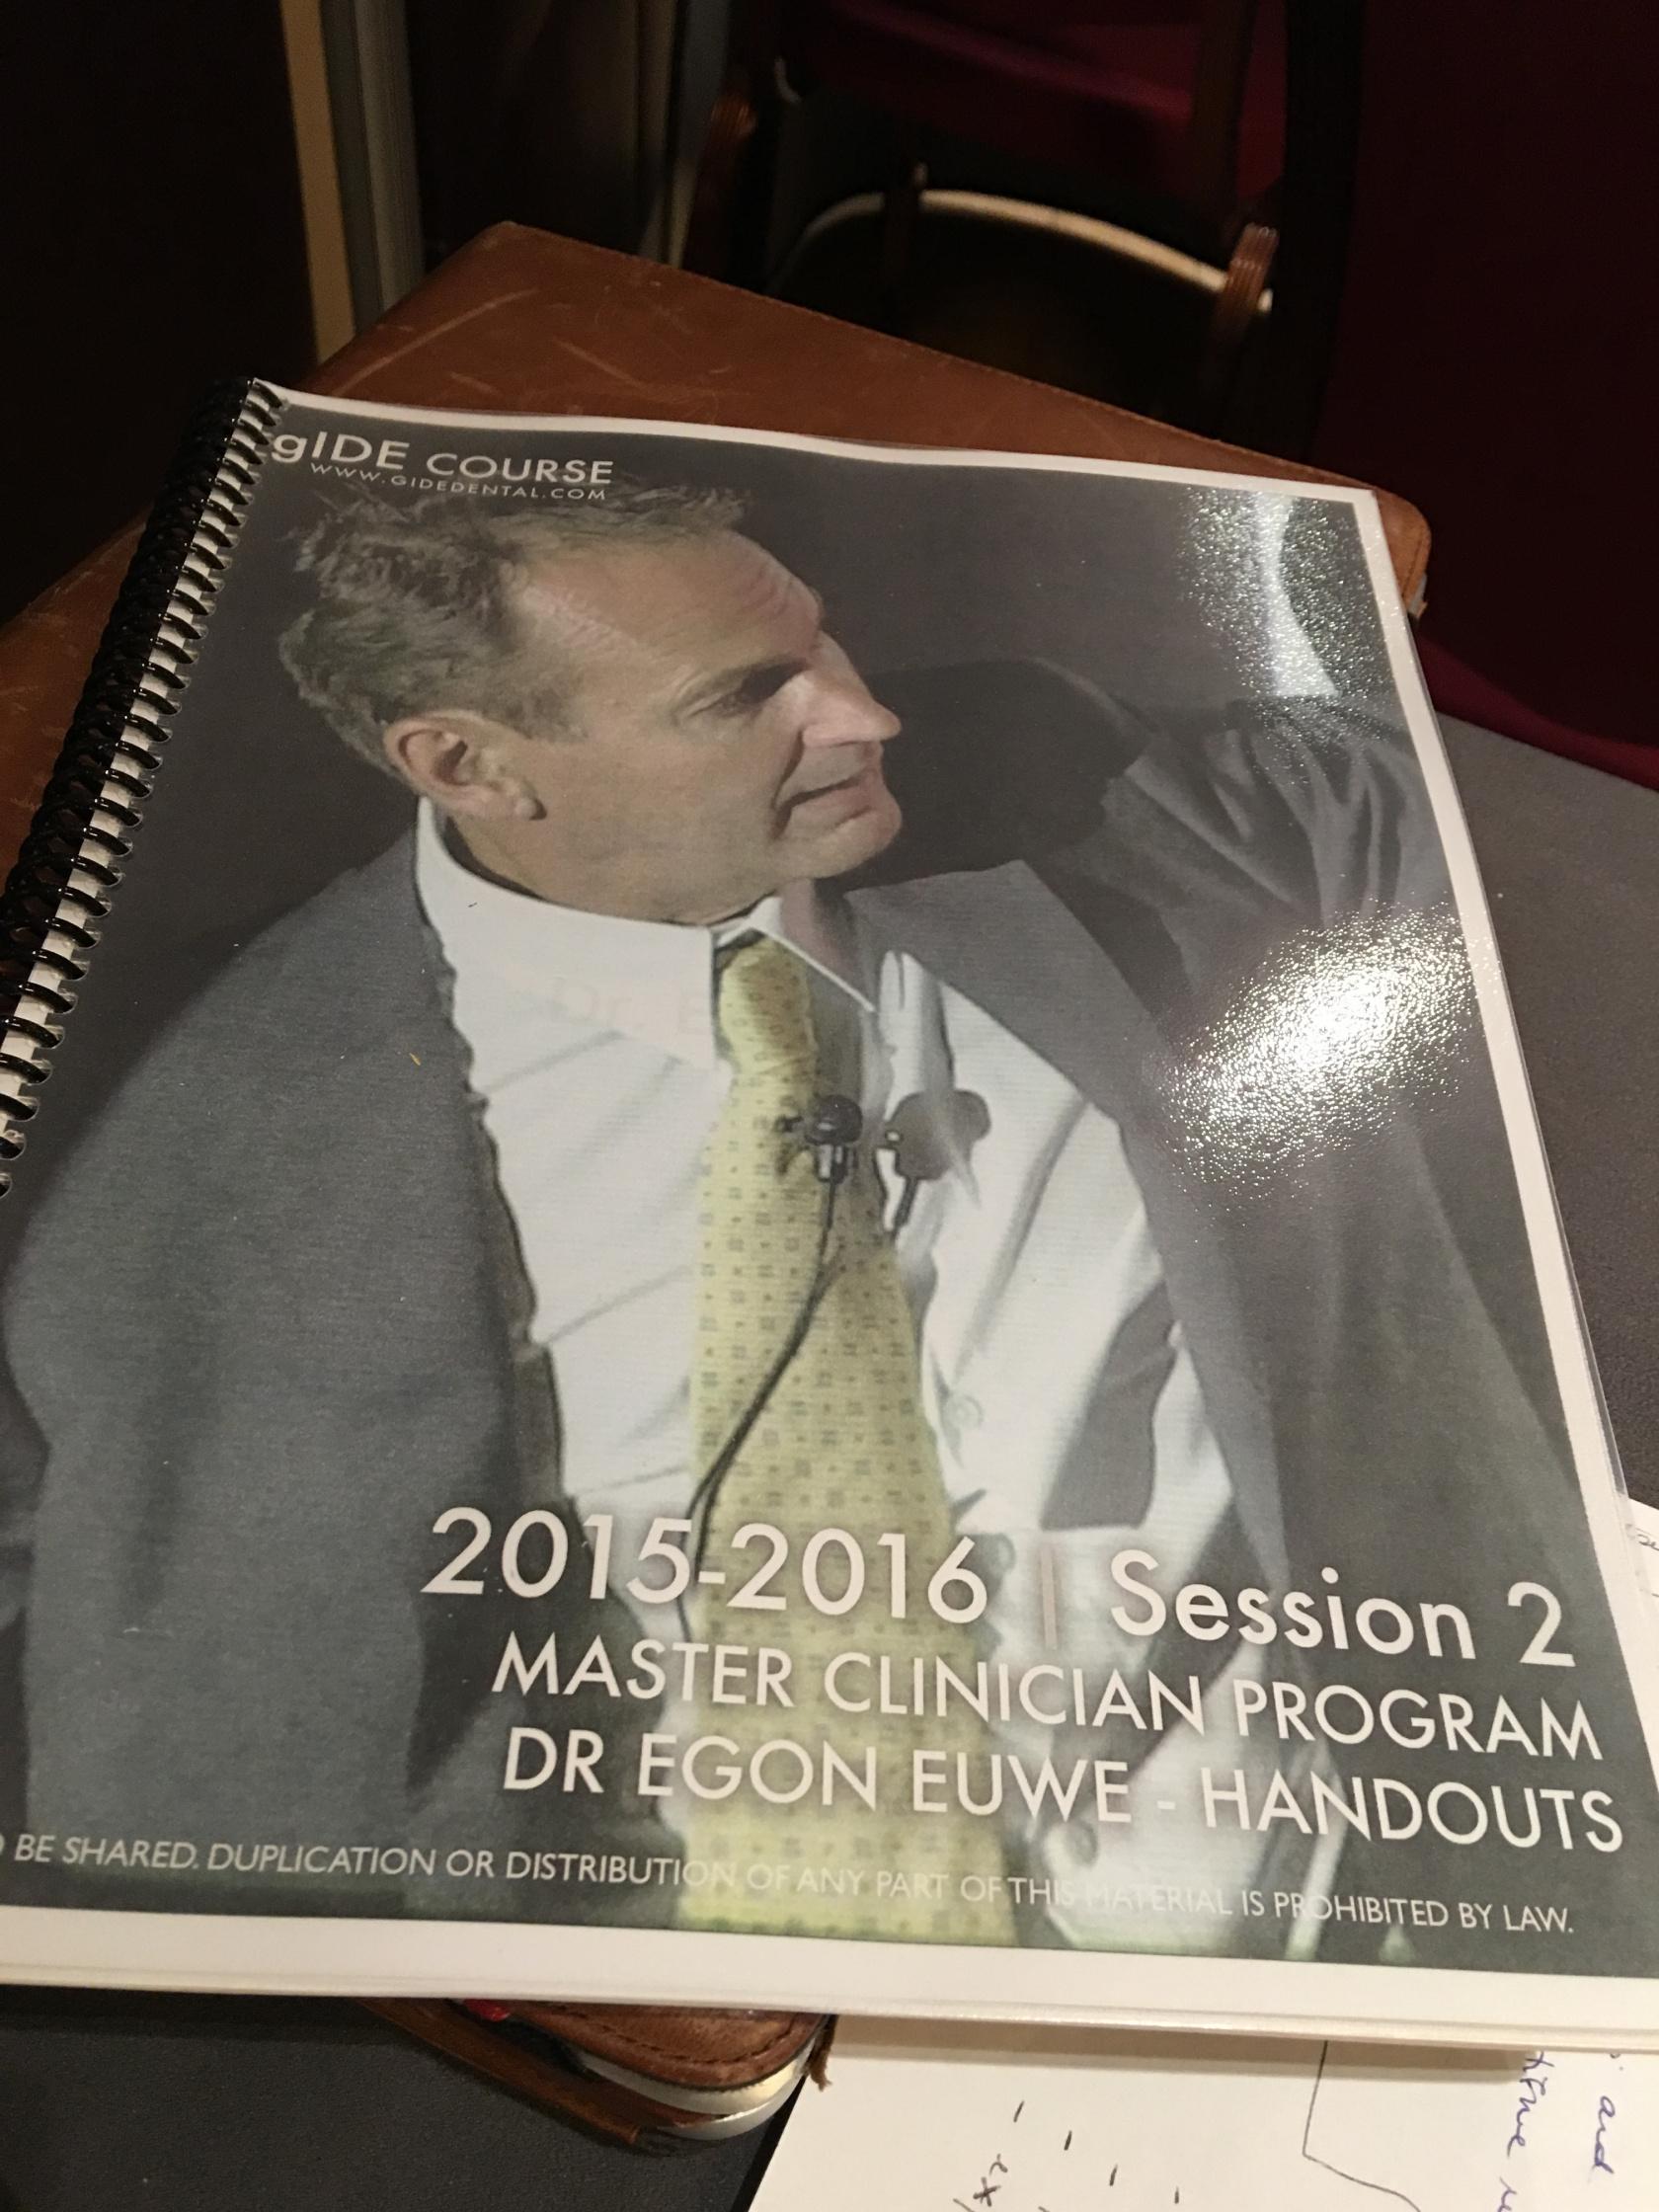 Un air de Kevin Costner pour le Dr Euwe – Dr Euwe looks like Kevin Costner